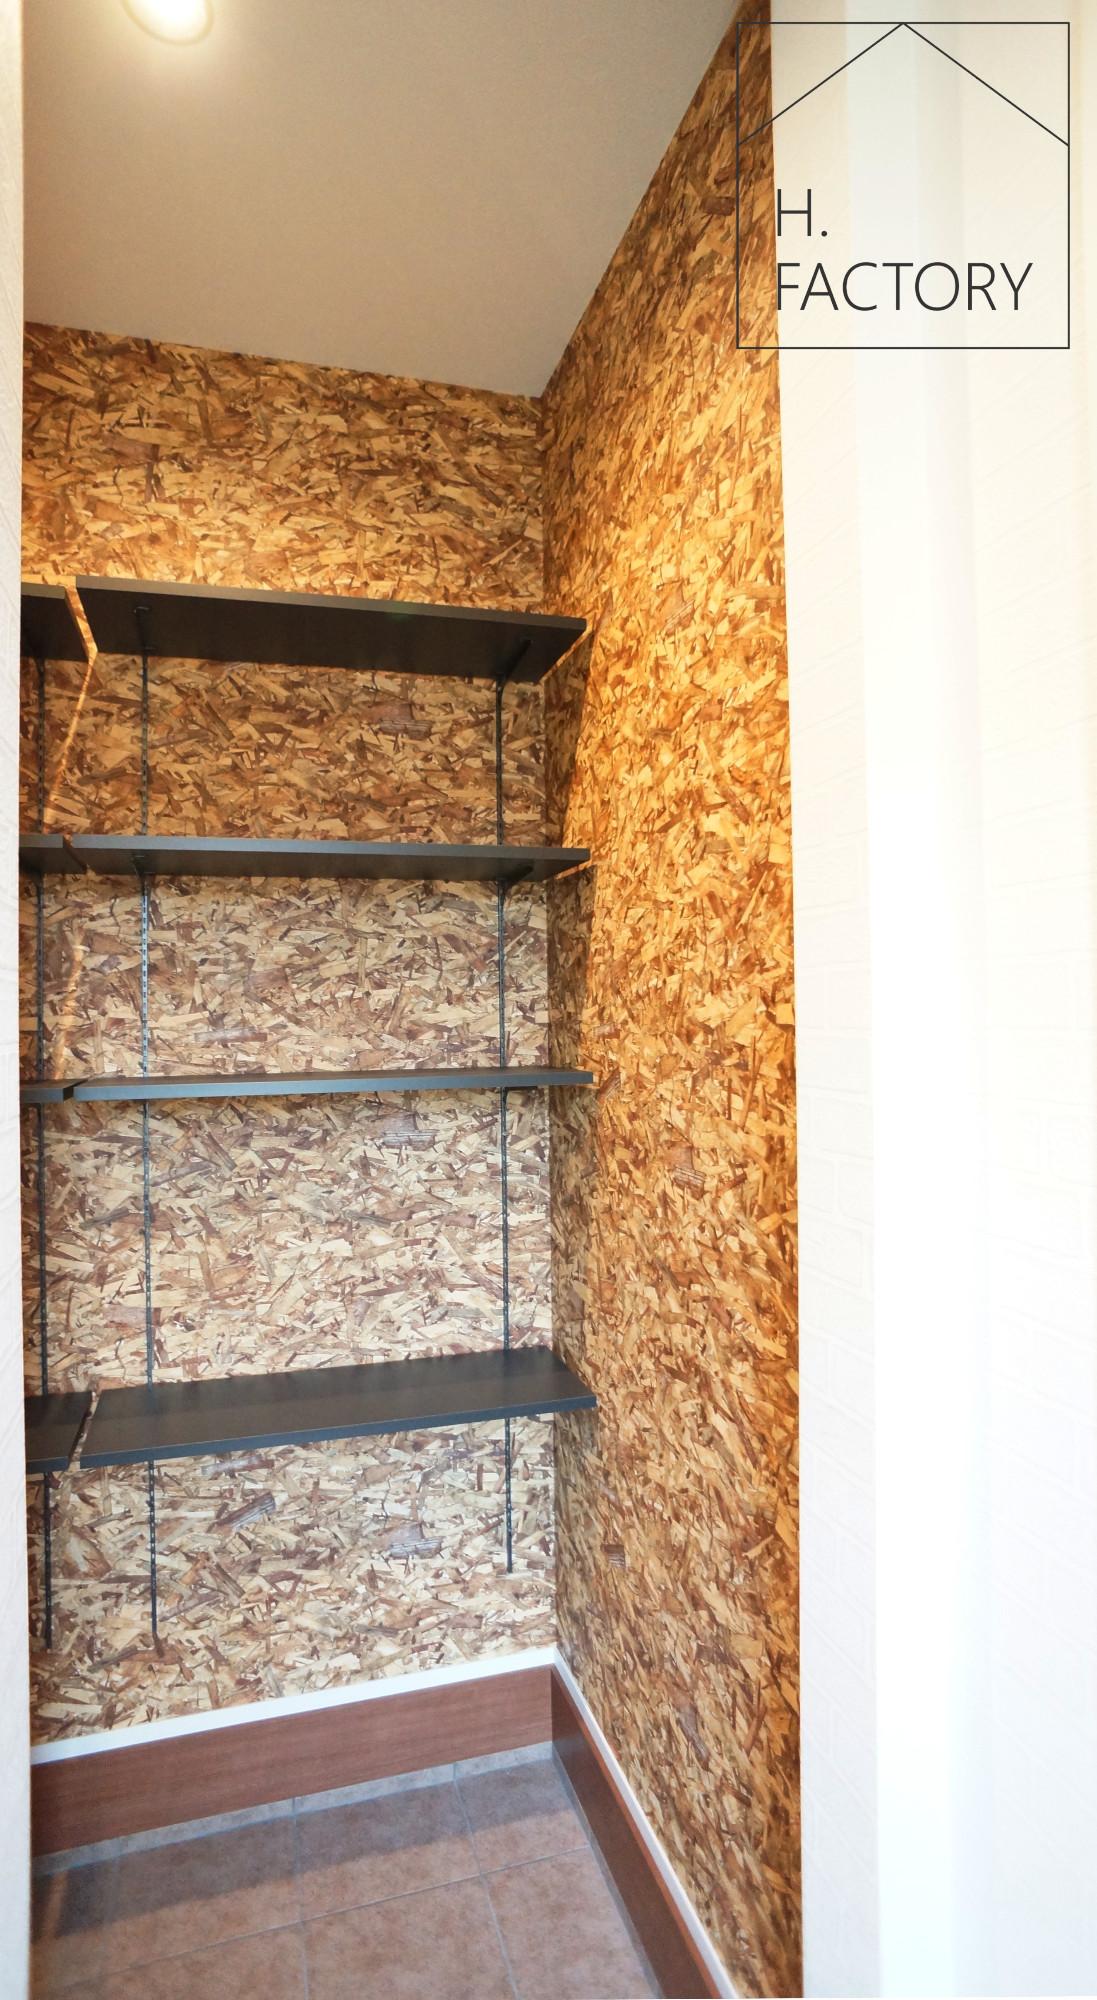 H.FACTORY/株式会社 橋本技建「インダストリアル&カワイイの家」の実例写真